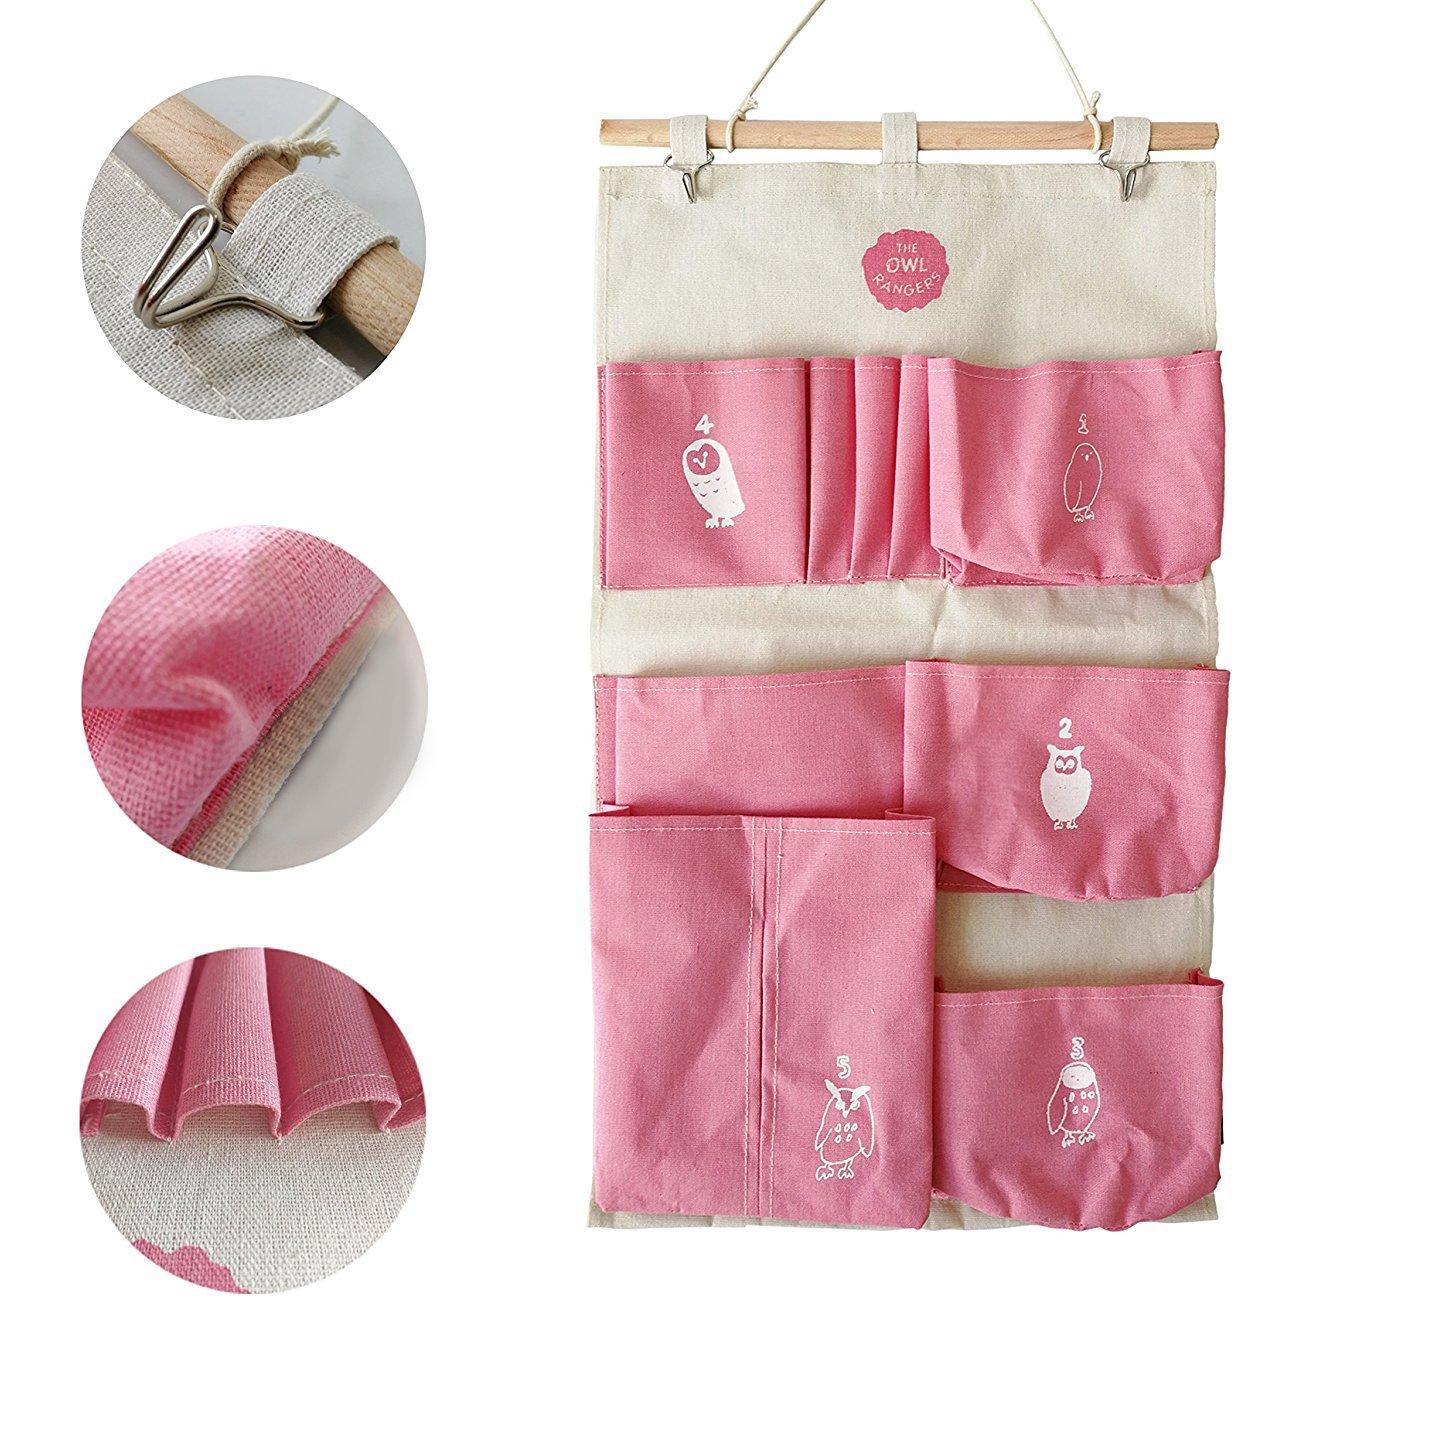 3 Pockets Wall Door Closet Home Hanging Storage Bag Linen Home Organizer AL